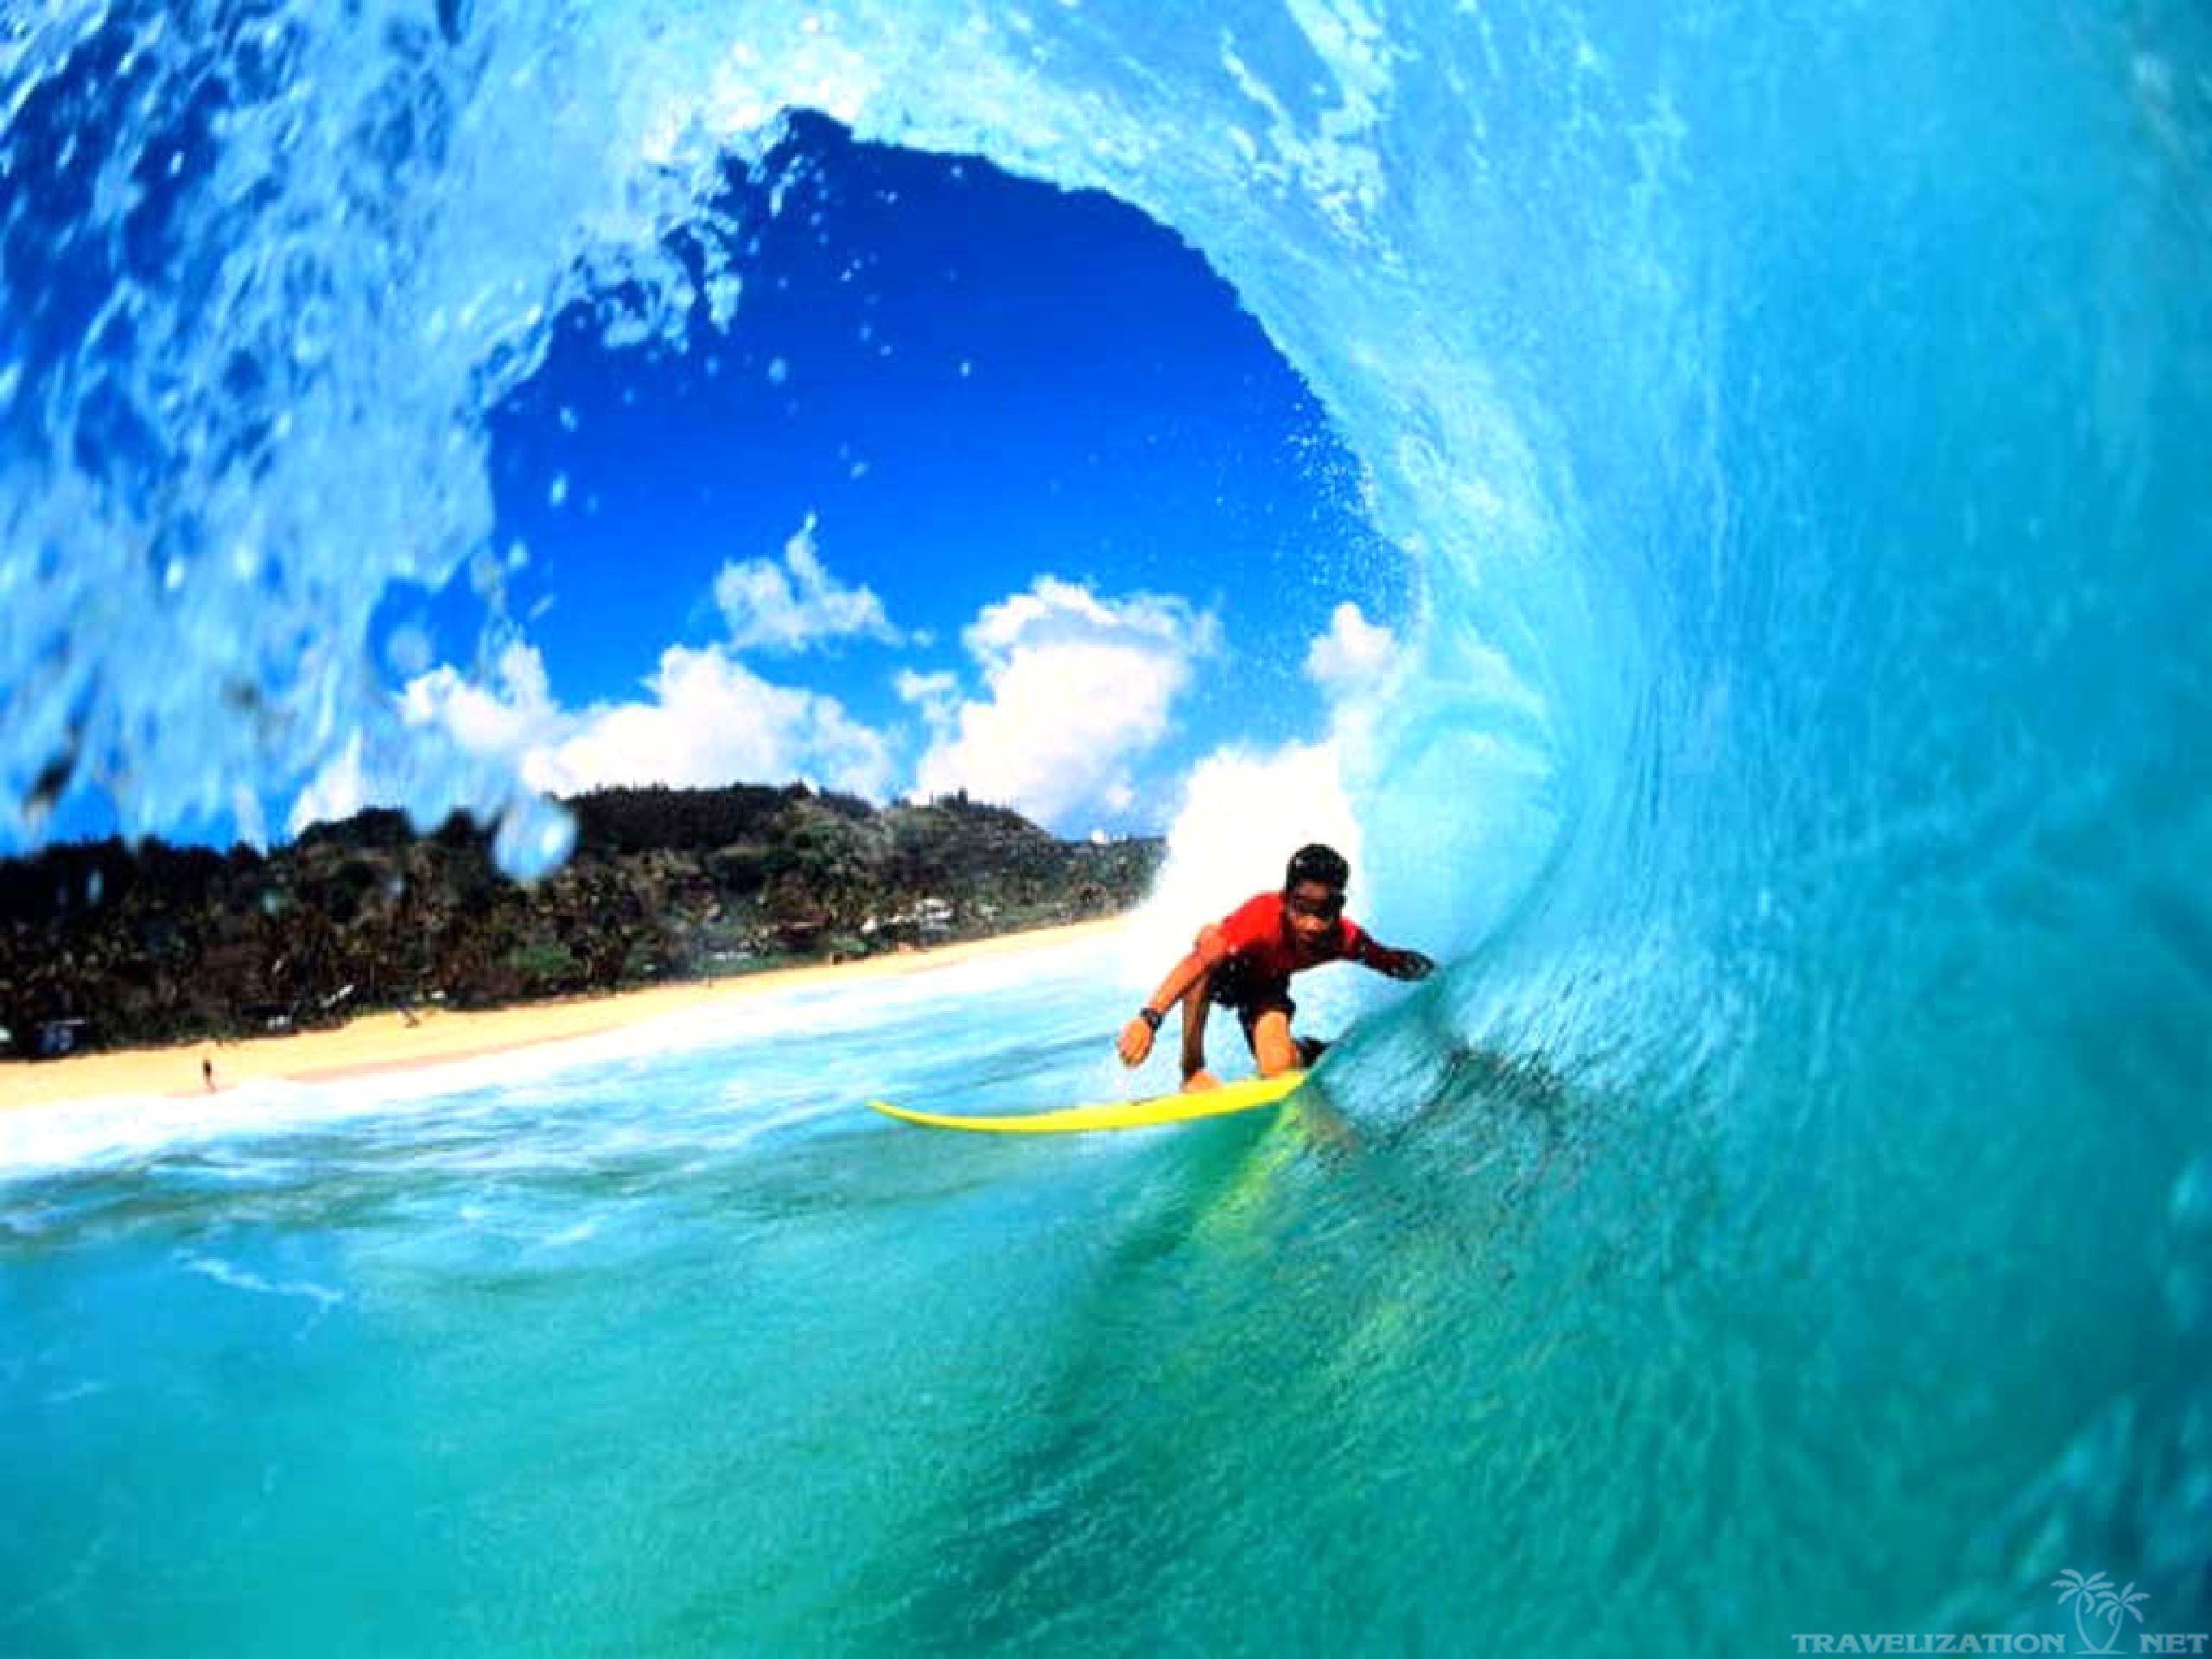 Cool Surfing Wallpapers | walljpeg.com